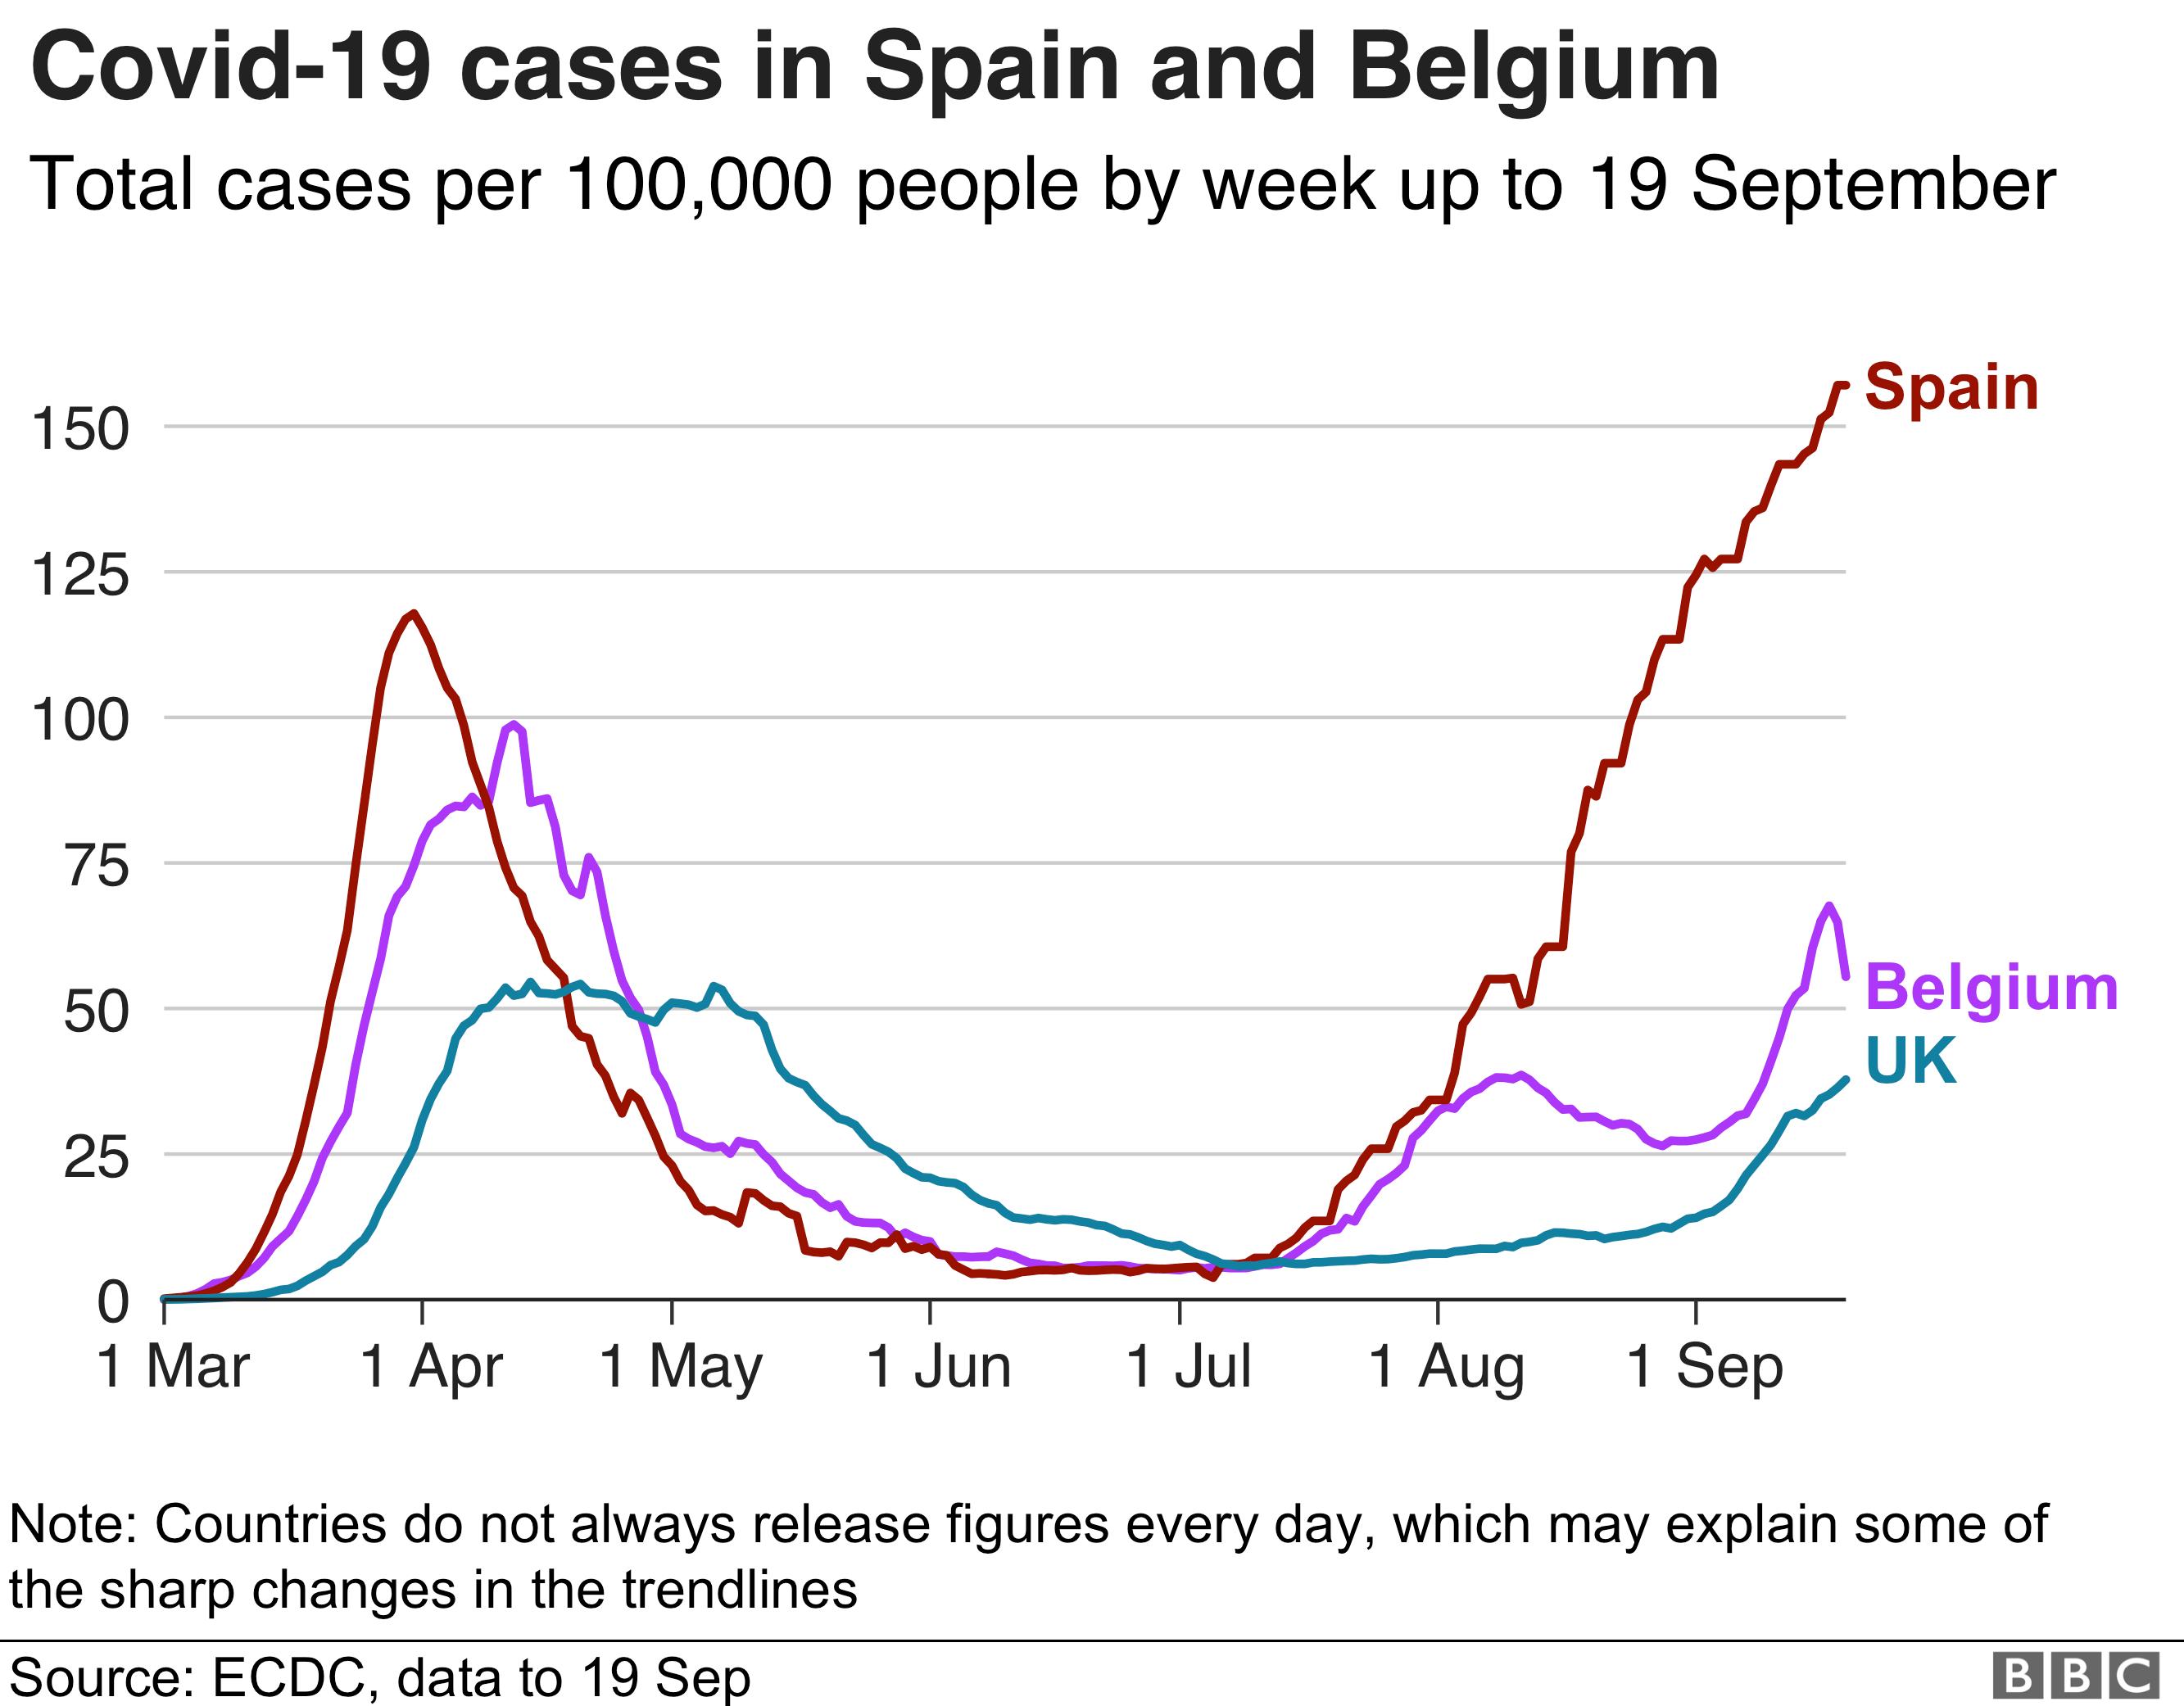 Graph showing coronavirus cases in Spain, Belgium and the UK